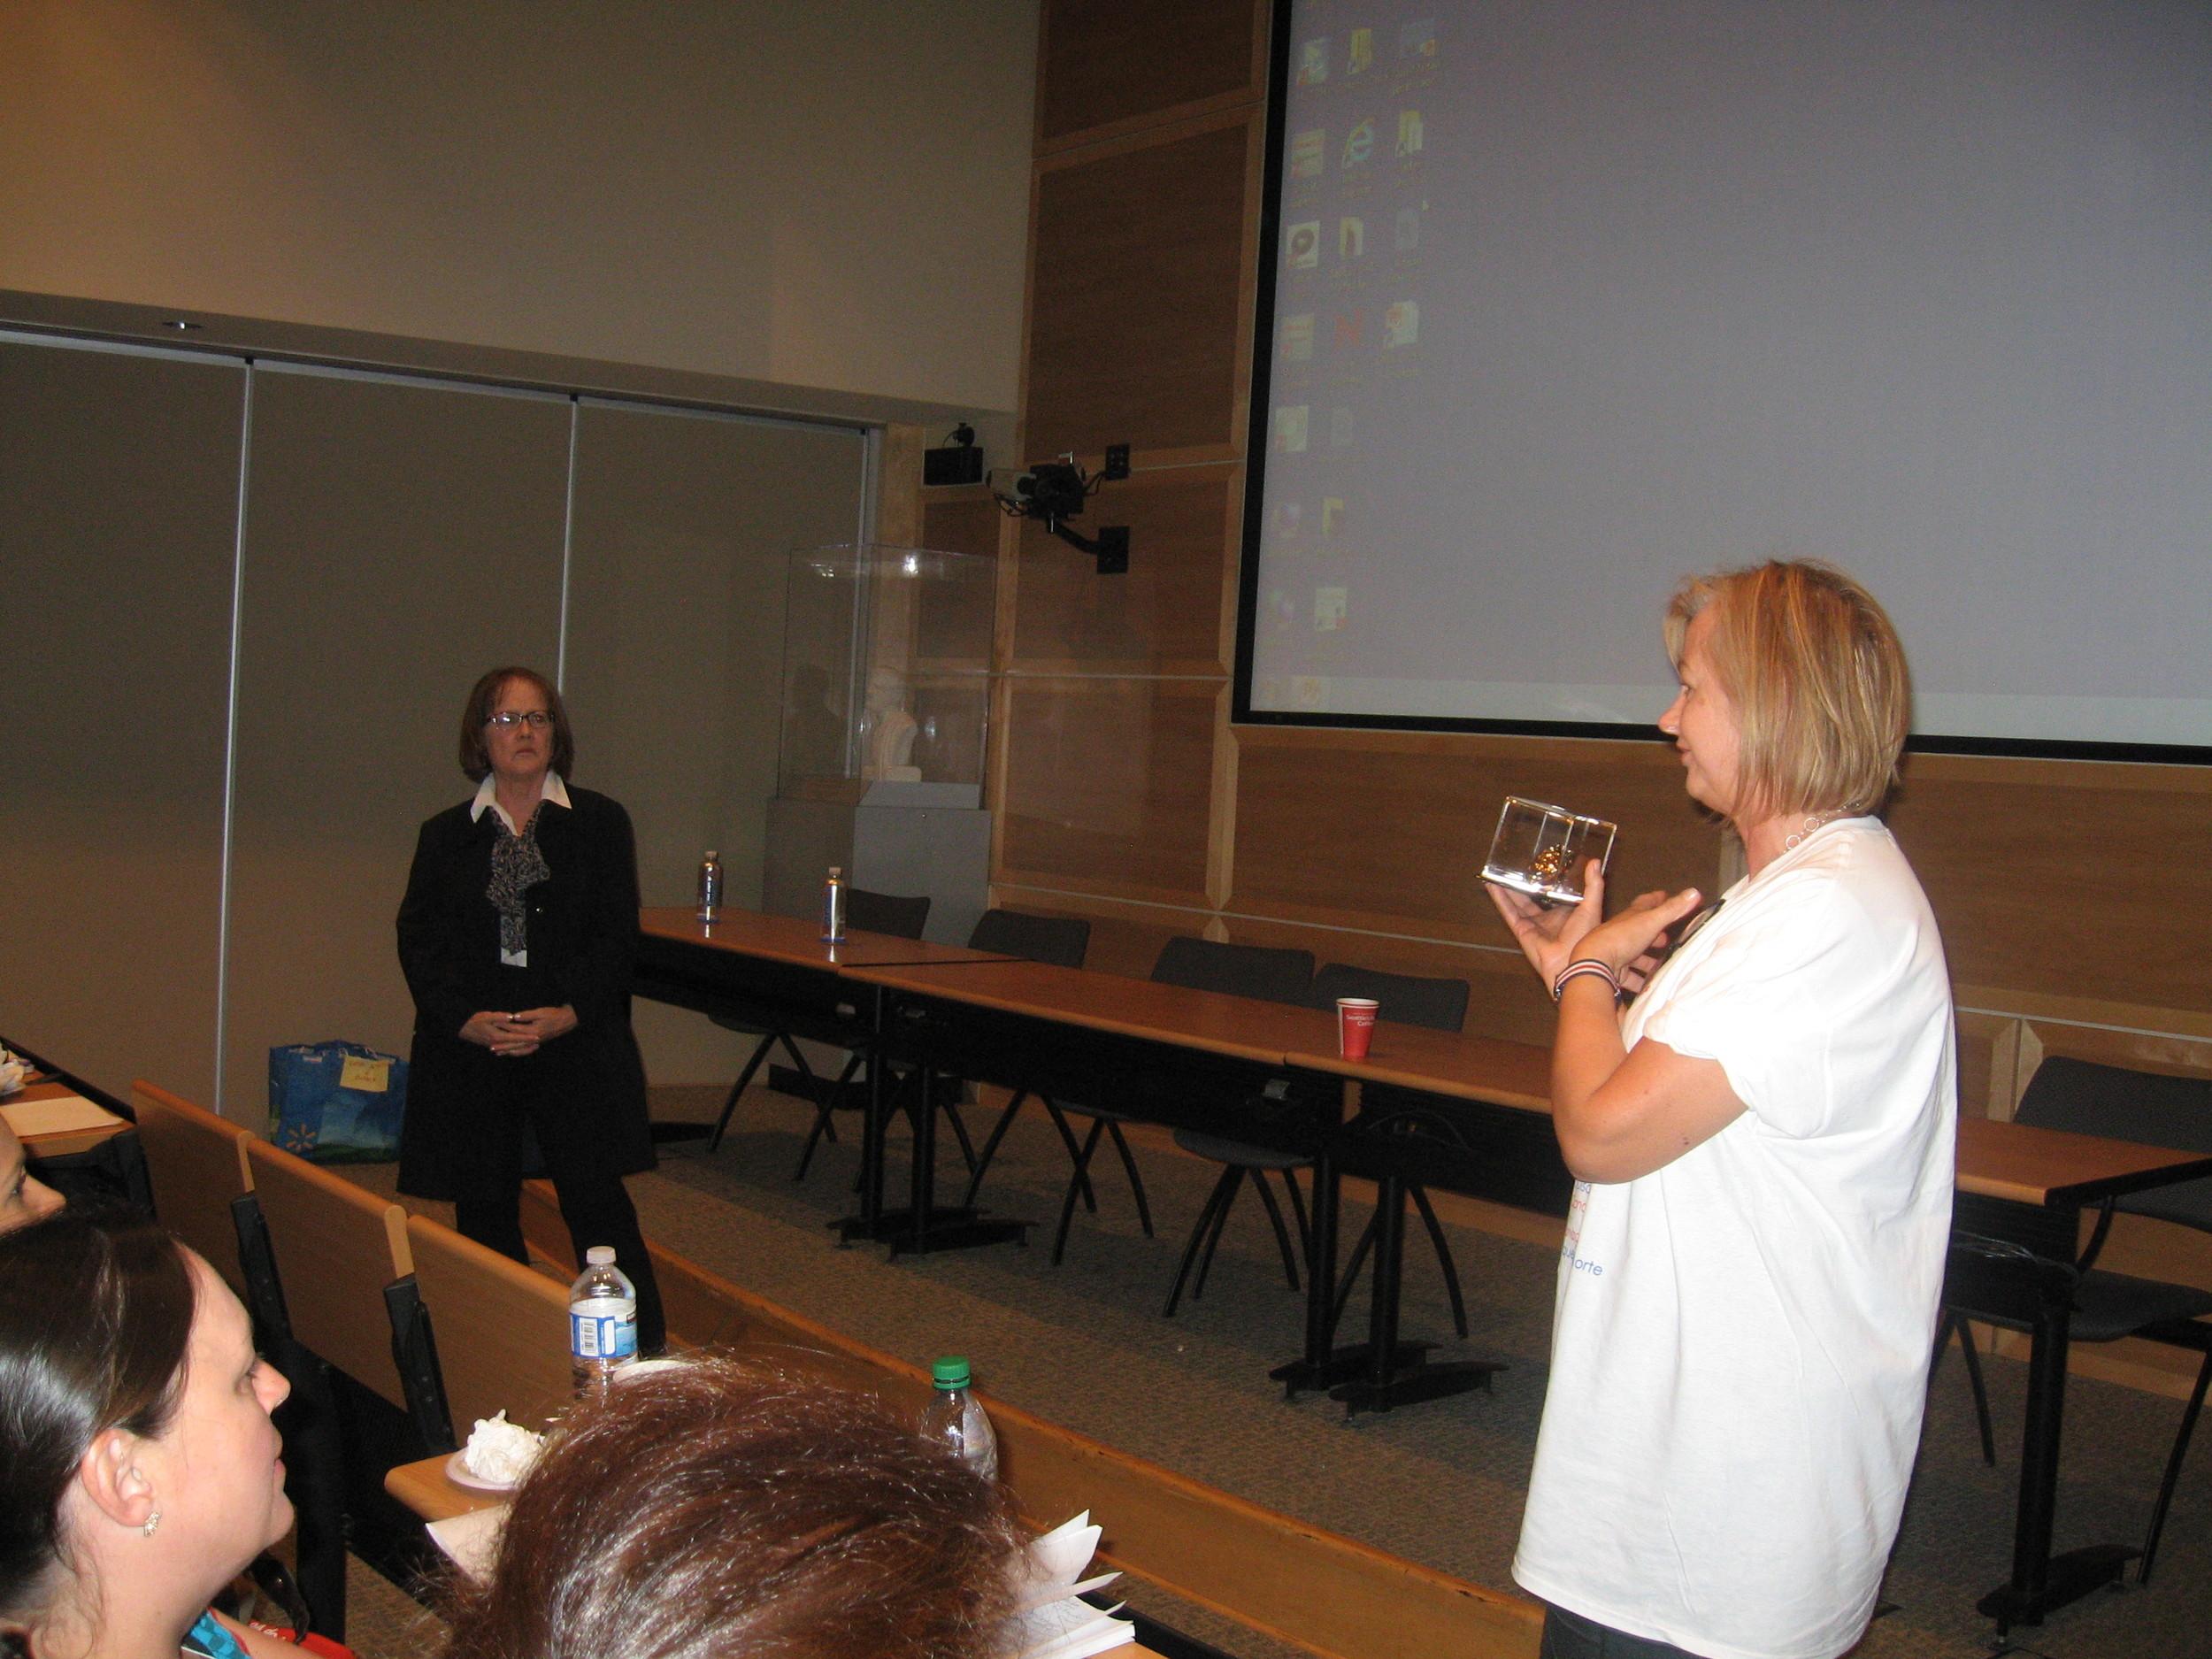 Josipa Paska, President of GADA Canada - Awarding Suzanne Drouin the Elizabeth McHenry Volunteer Award